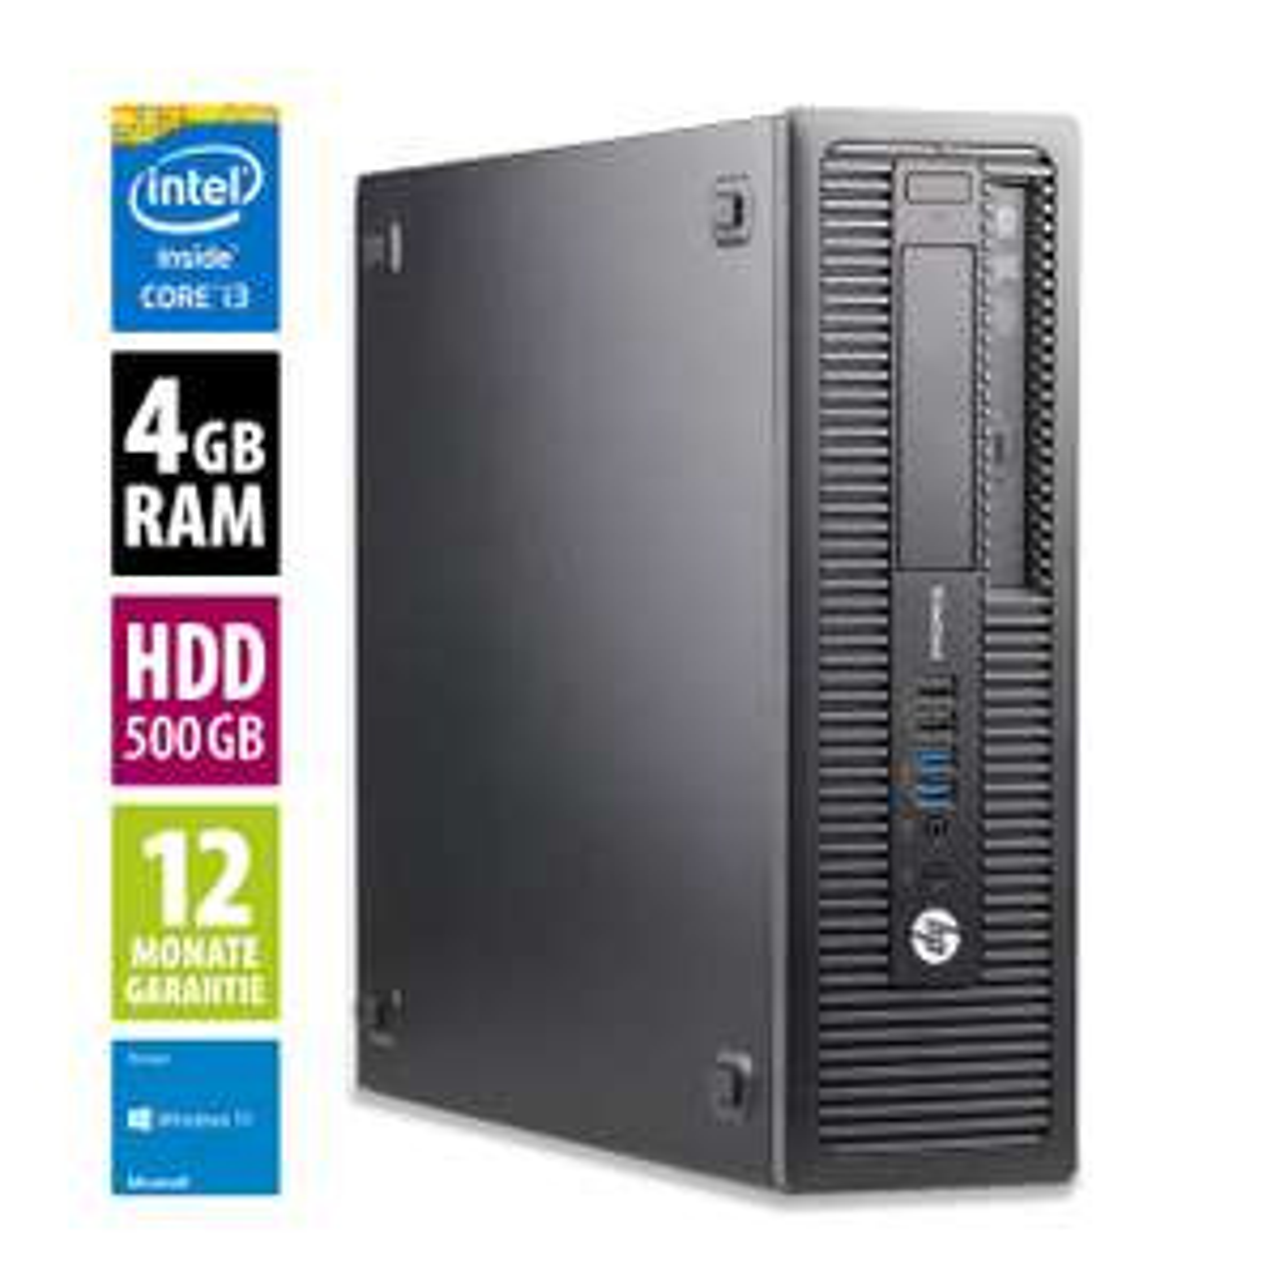 Office-Rechner HP EliteDesk 800 G1 SFF (i3-4130, 4GB DDR3-RAM, 500GB HDD, 4x USB 3.0, 6x USB 2.0, 2x DisplayPort, VGA, LAN, DVD, Win10 Home)